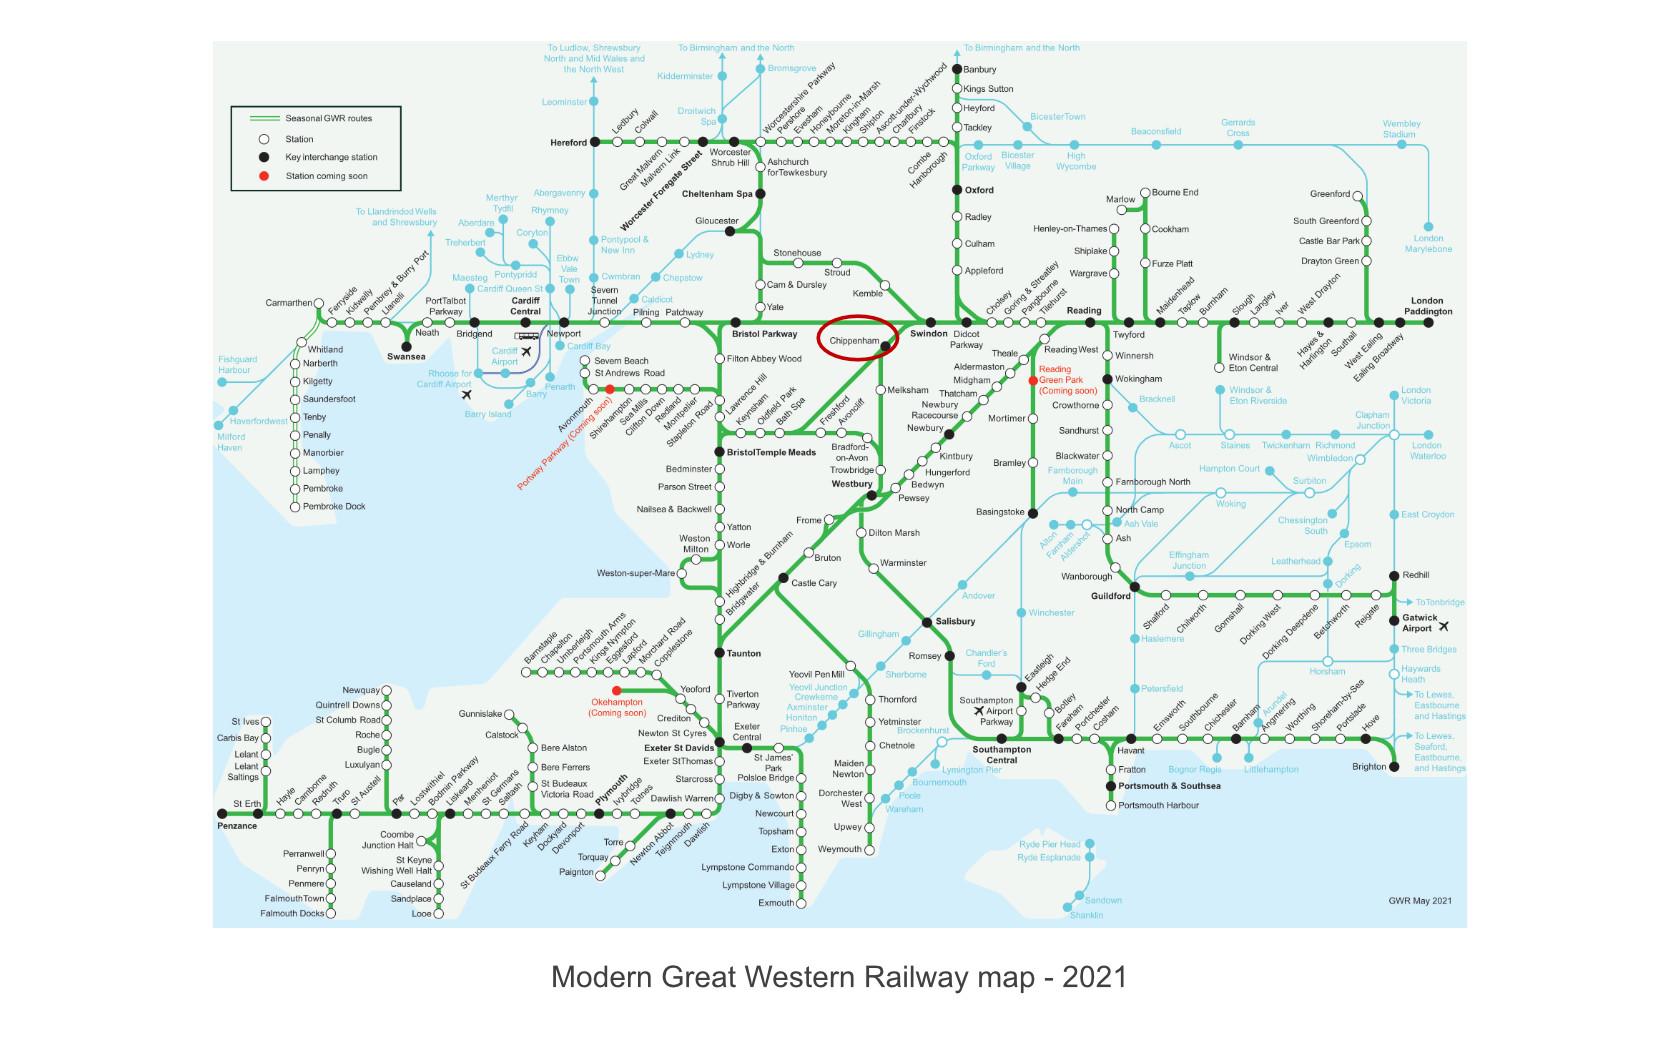 modern great western railway map 2021